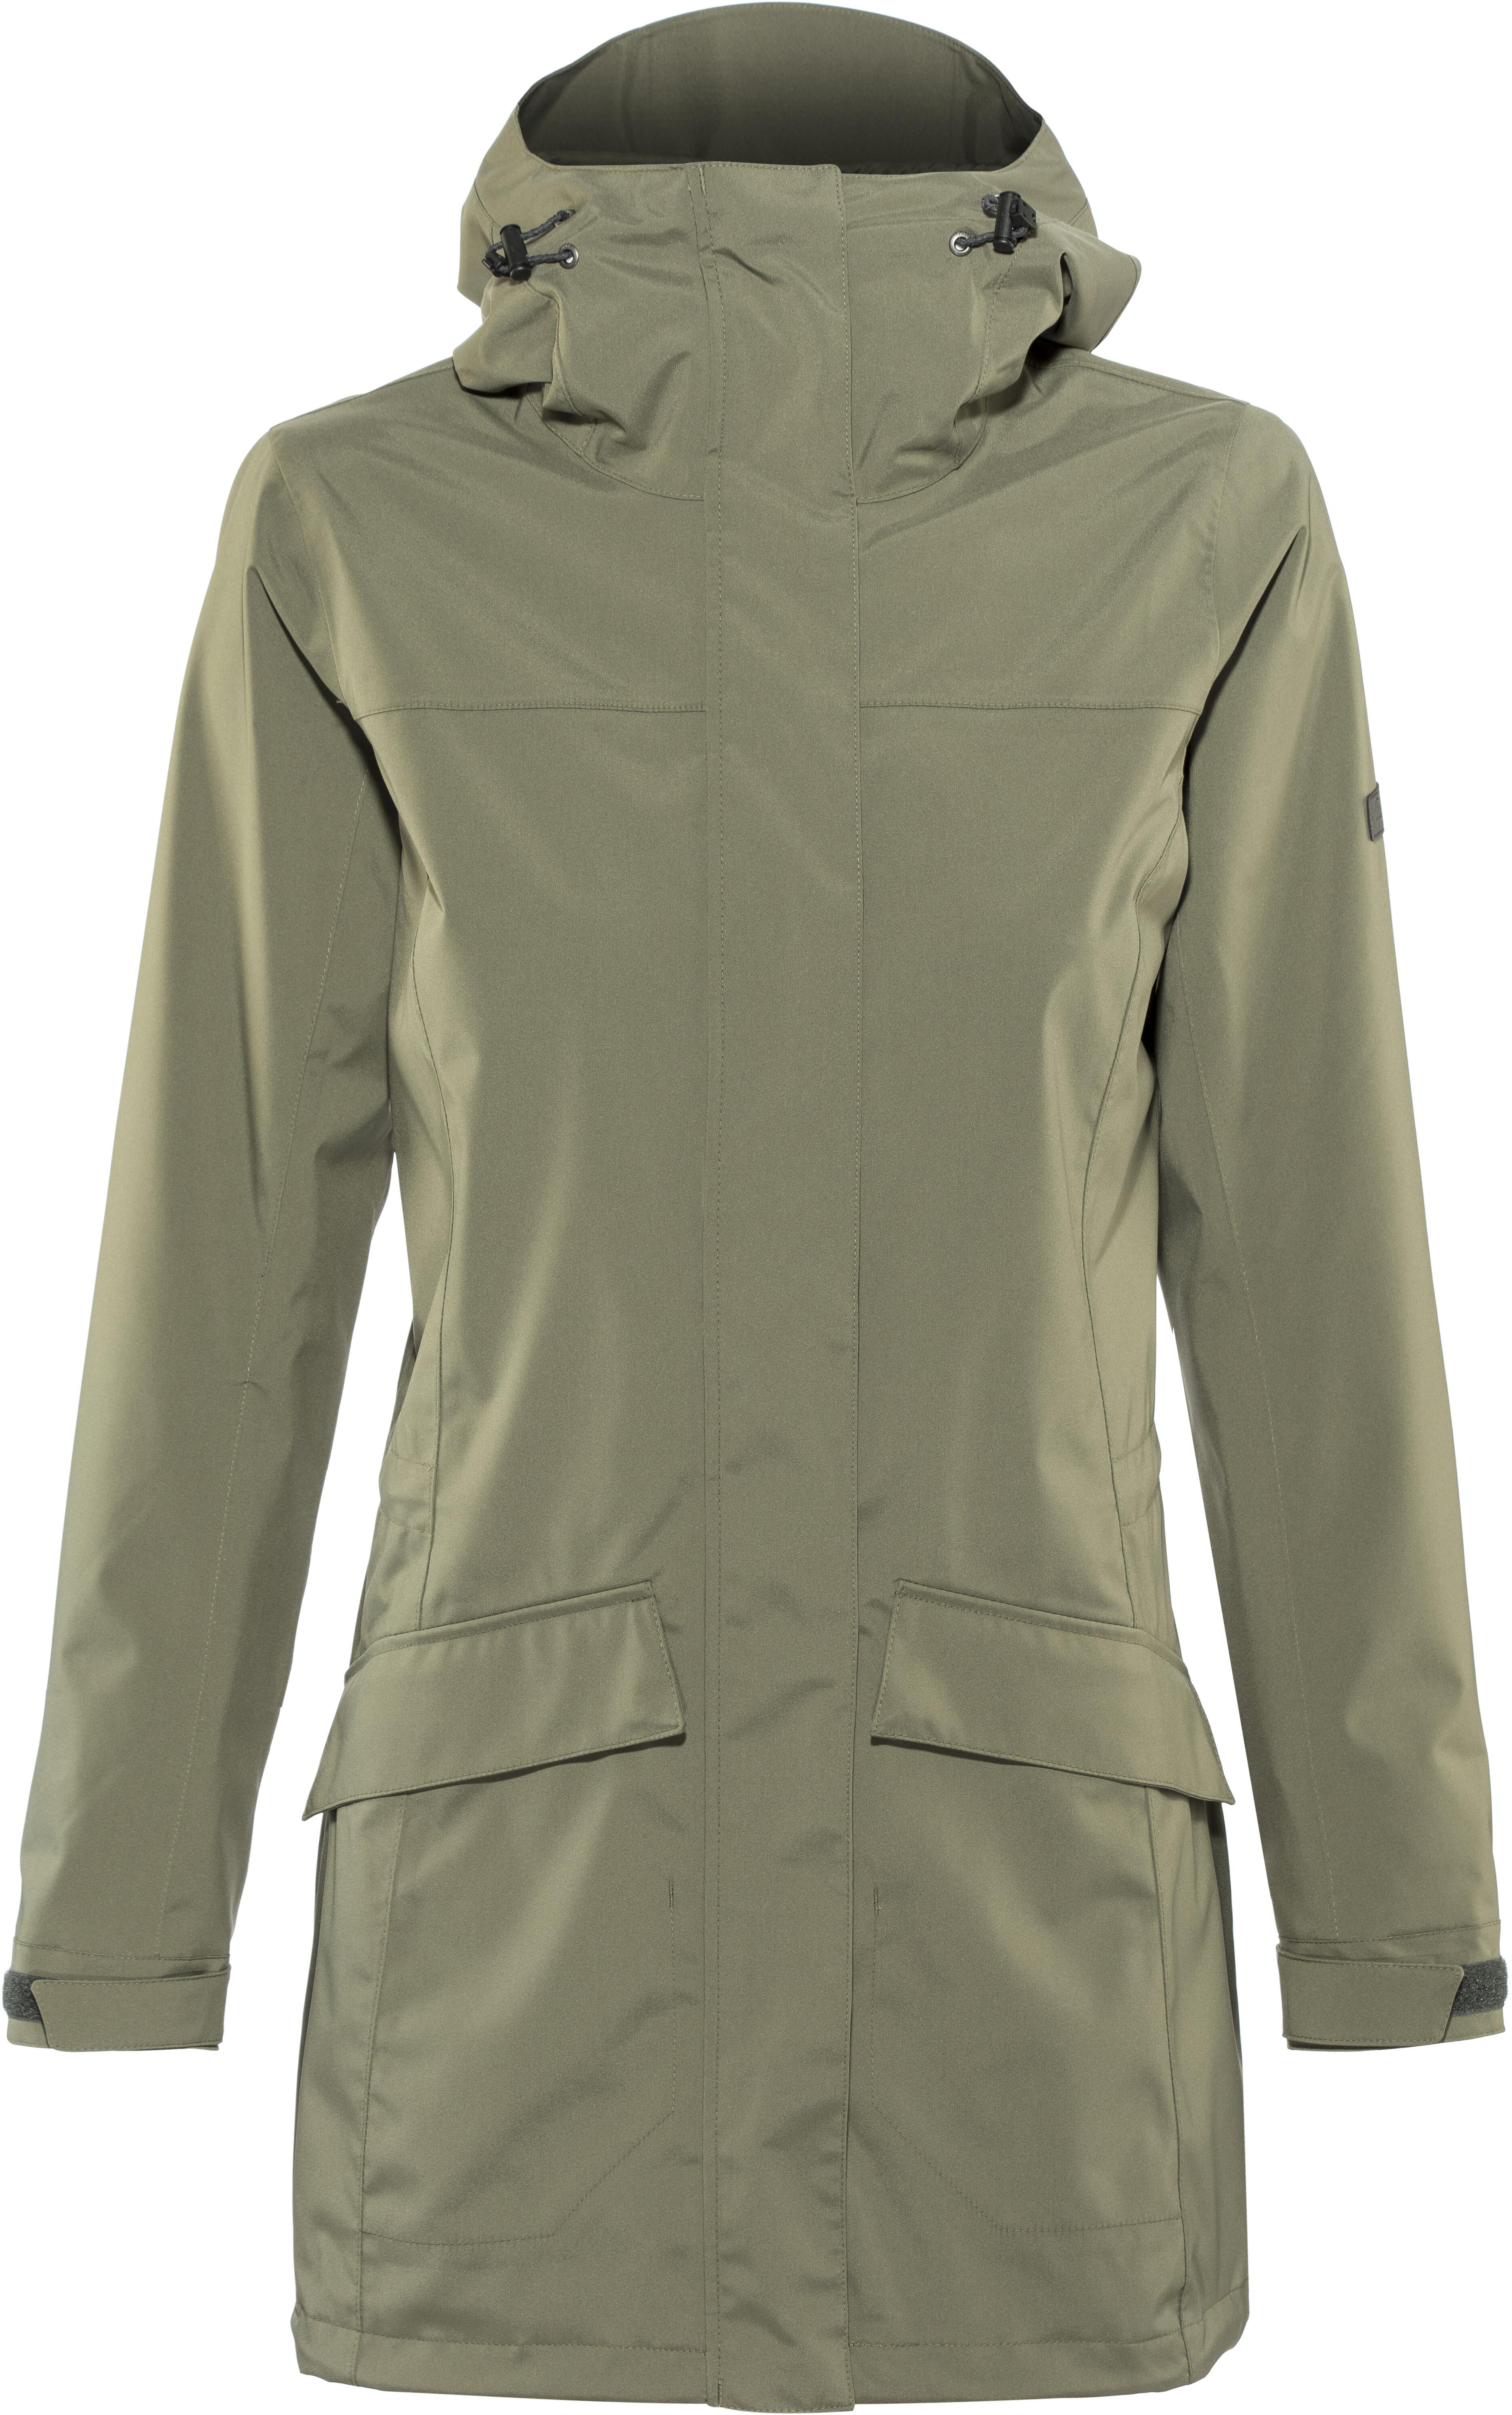 49ca3c25f07 Bergans Oslo 2L Jacket Women green mud at Addnature.co.uk